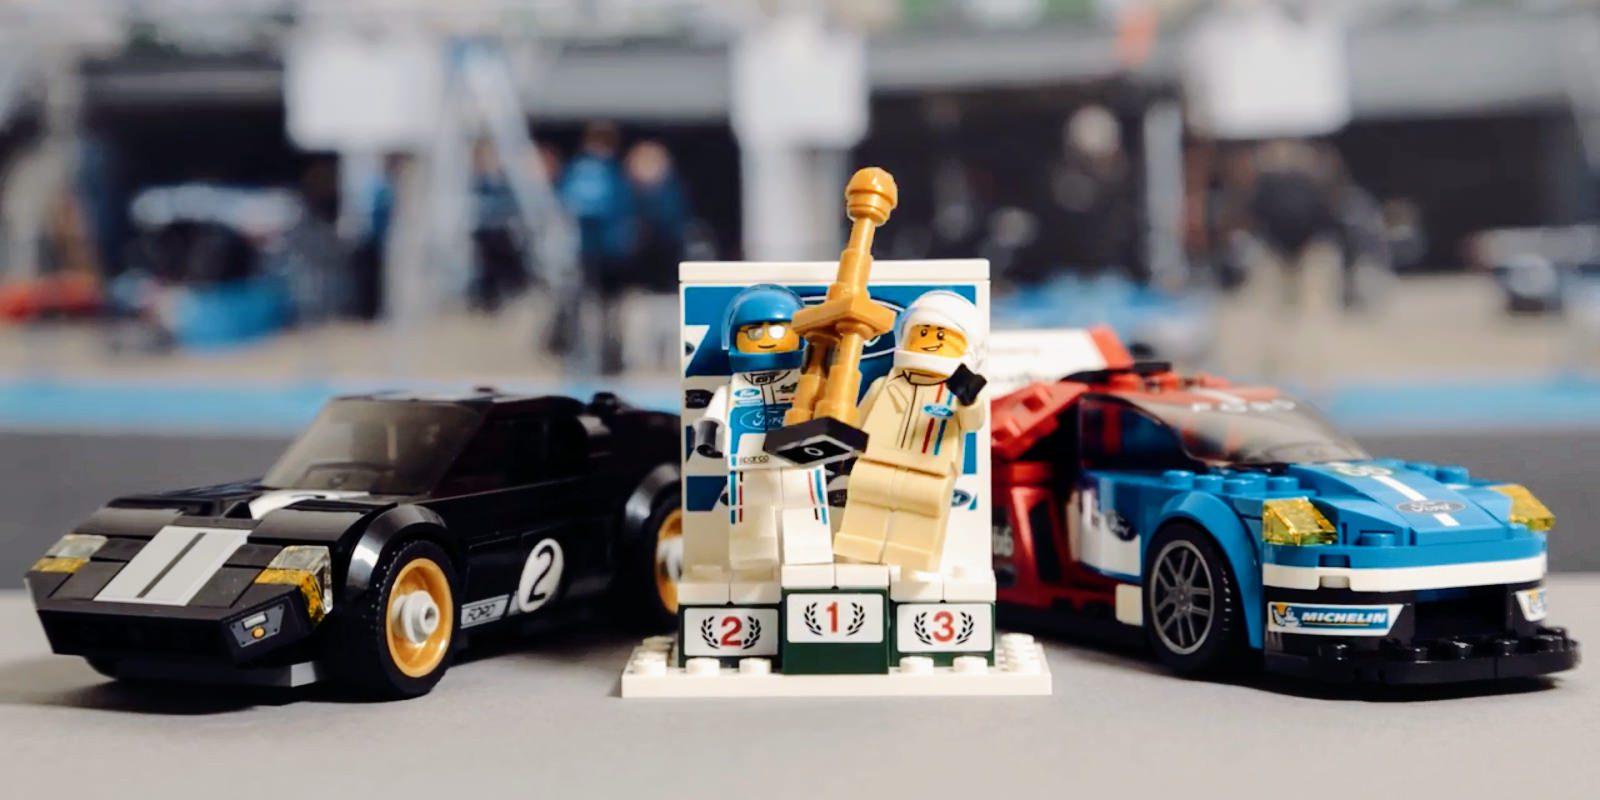 lego-ford-le-mans-cars